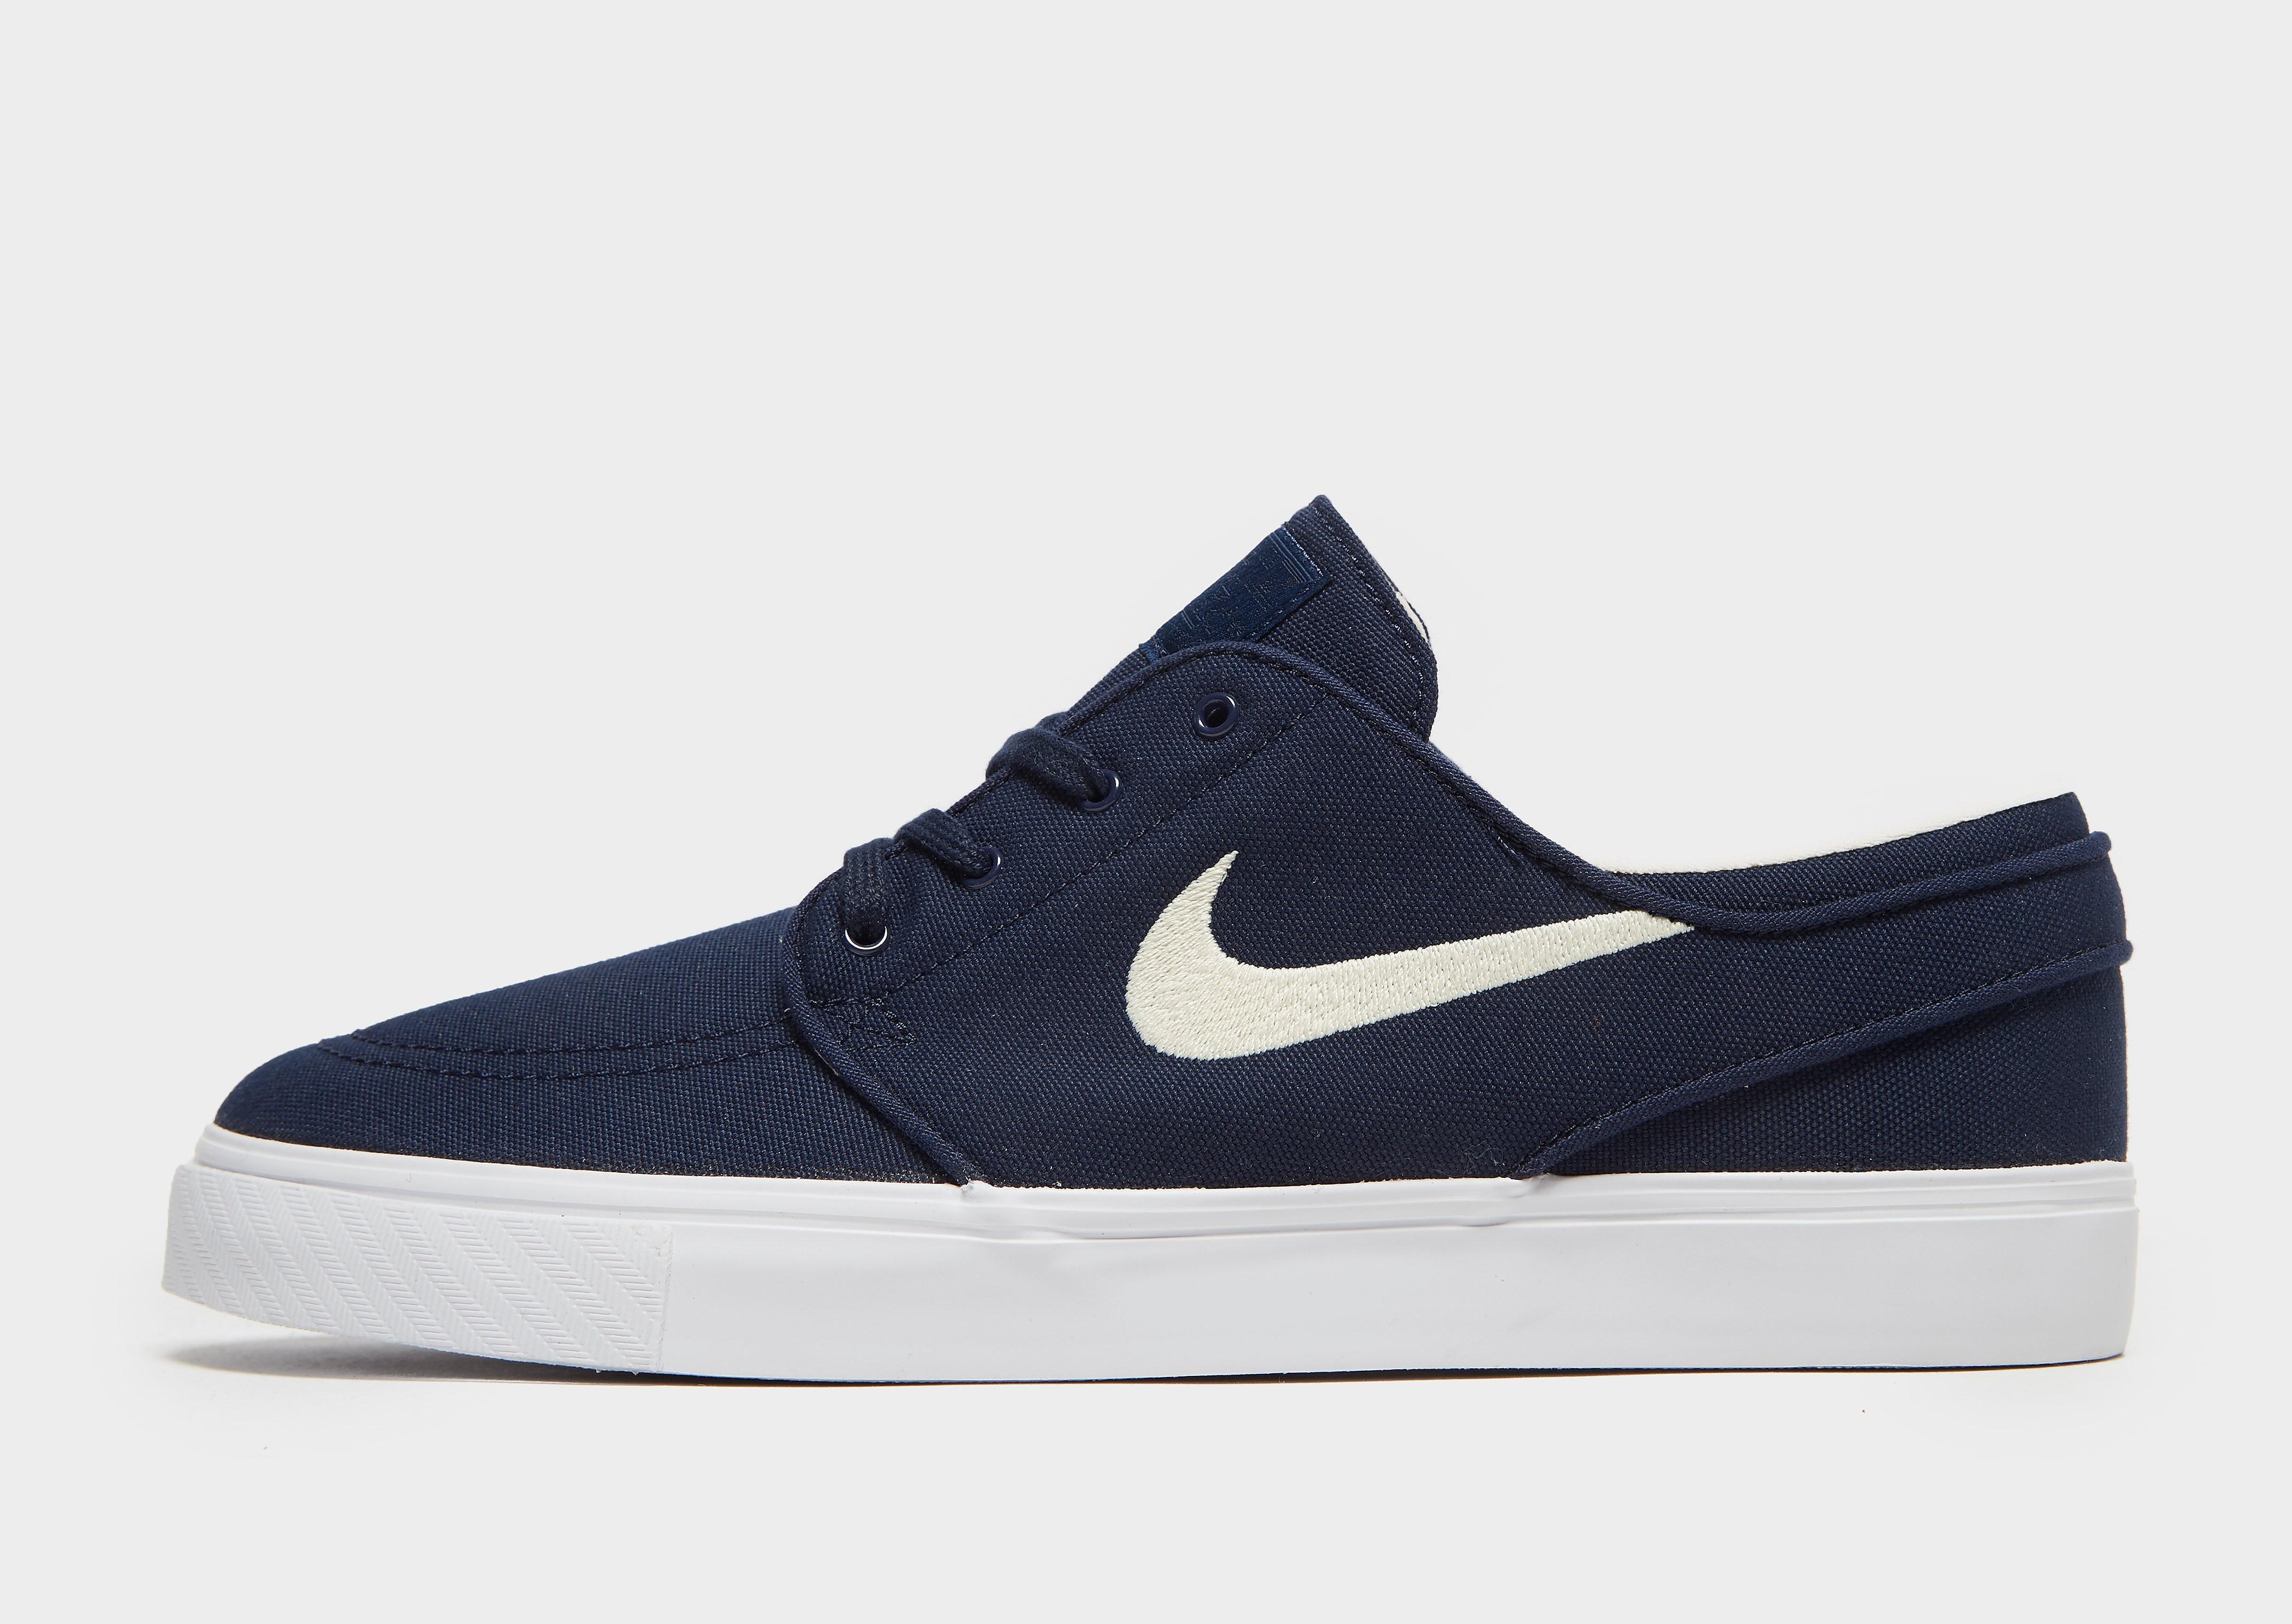 e16038cc098 Precios de sneakers Nike SB Zoom Stefan Janoski talla 42 baratas ...